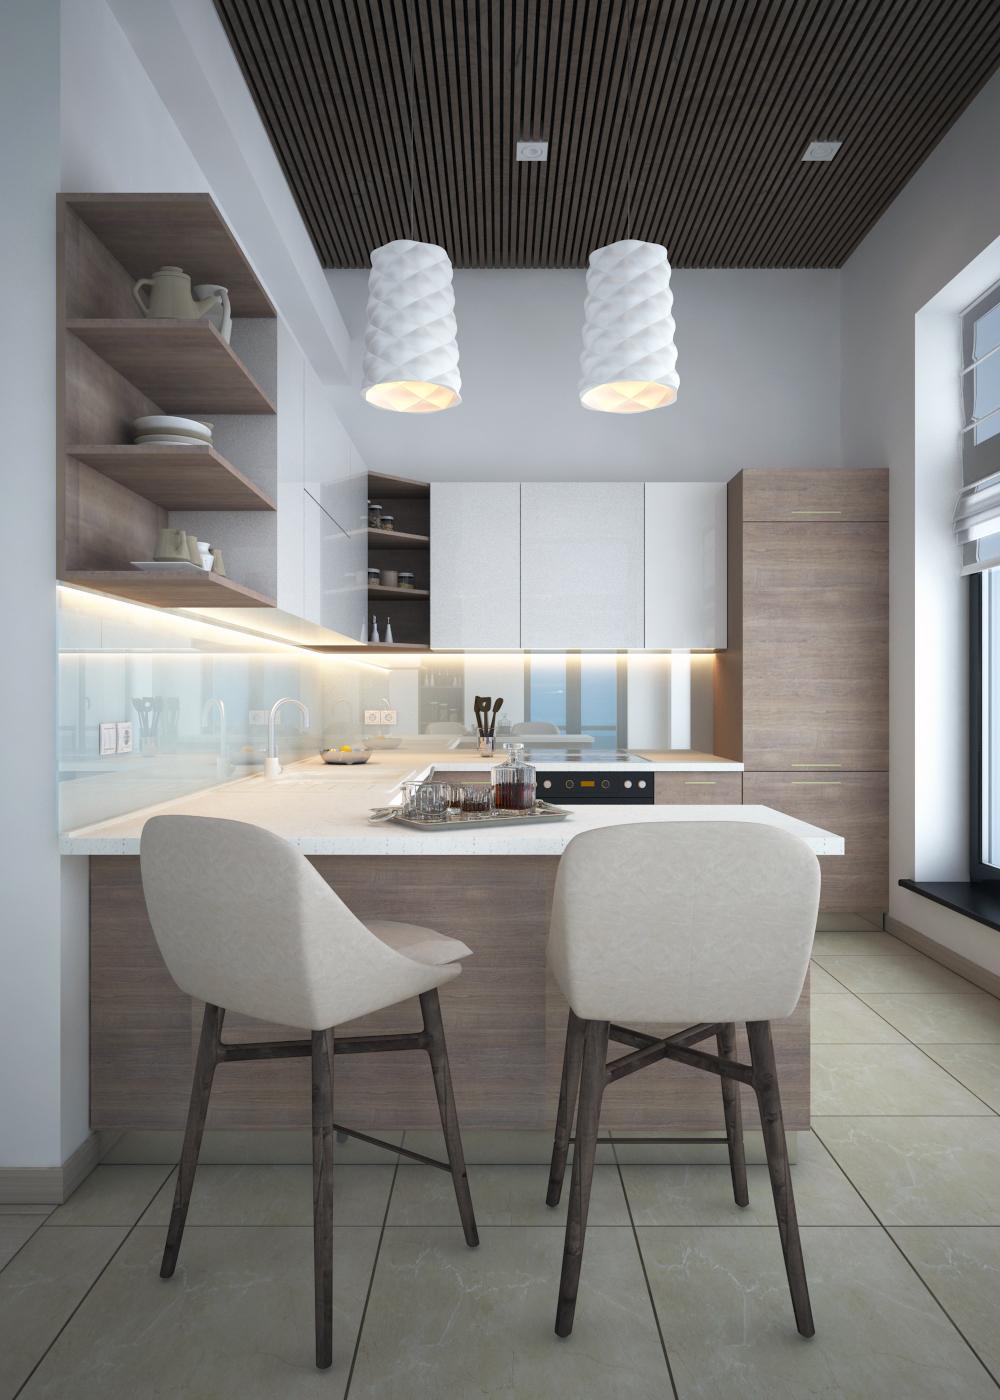 12_1_floor_kitchen_view 1.jpg